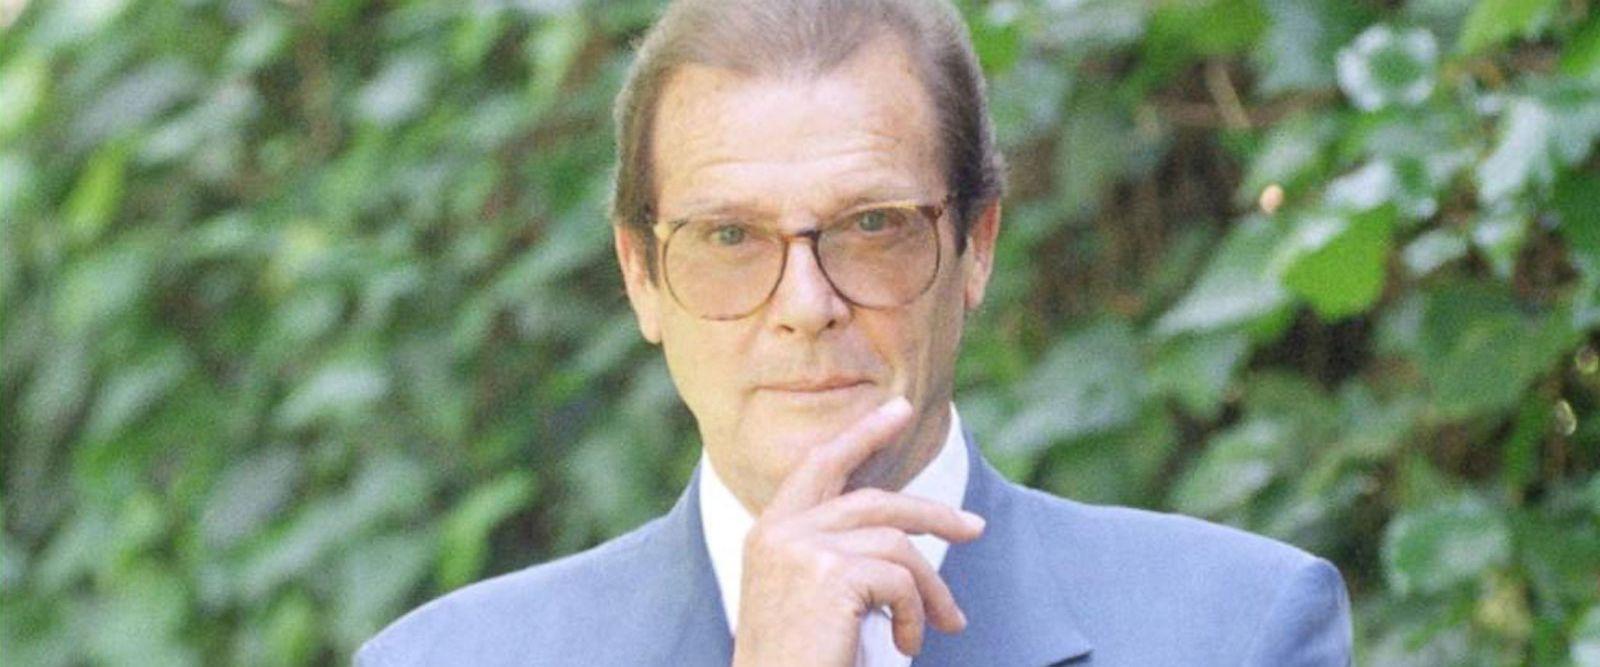 VIDEO: 'James Bond' star Roger Moore dead at 89